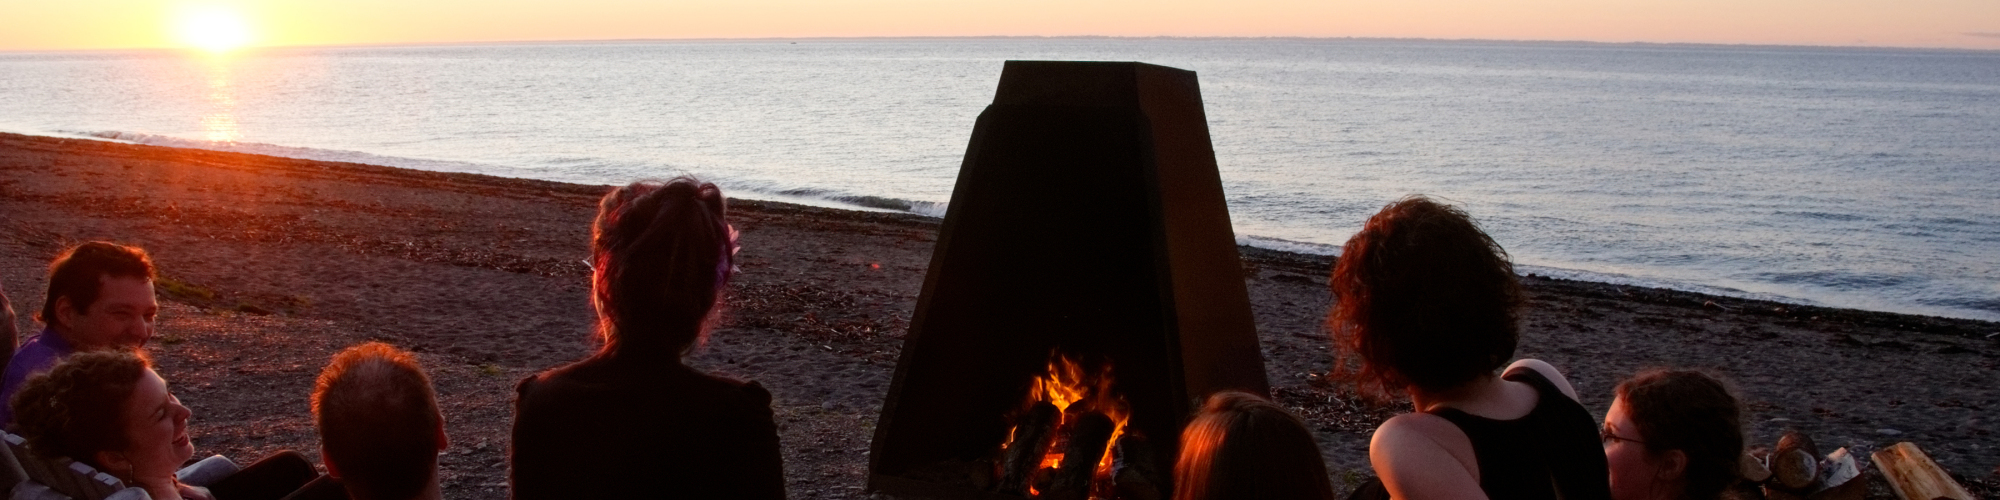 People around a bonfire, sunset